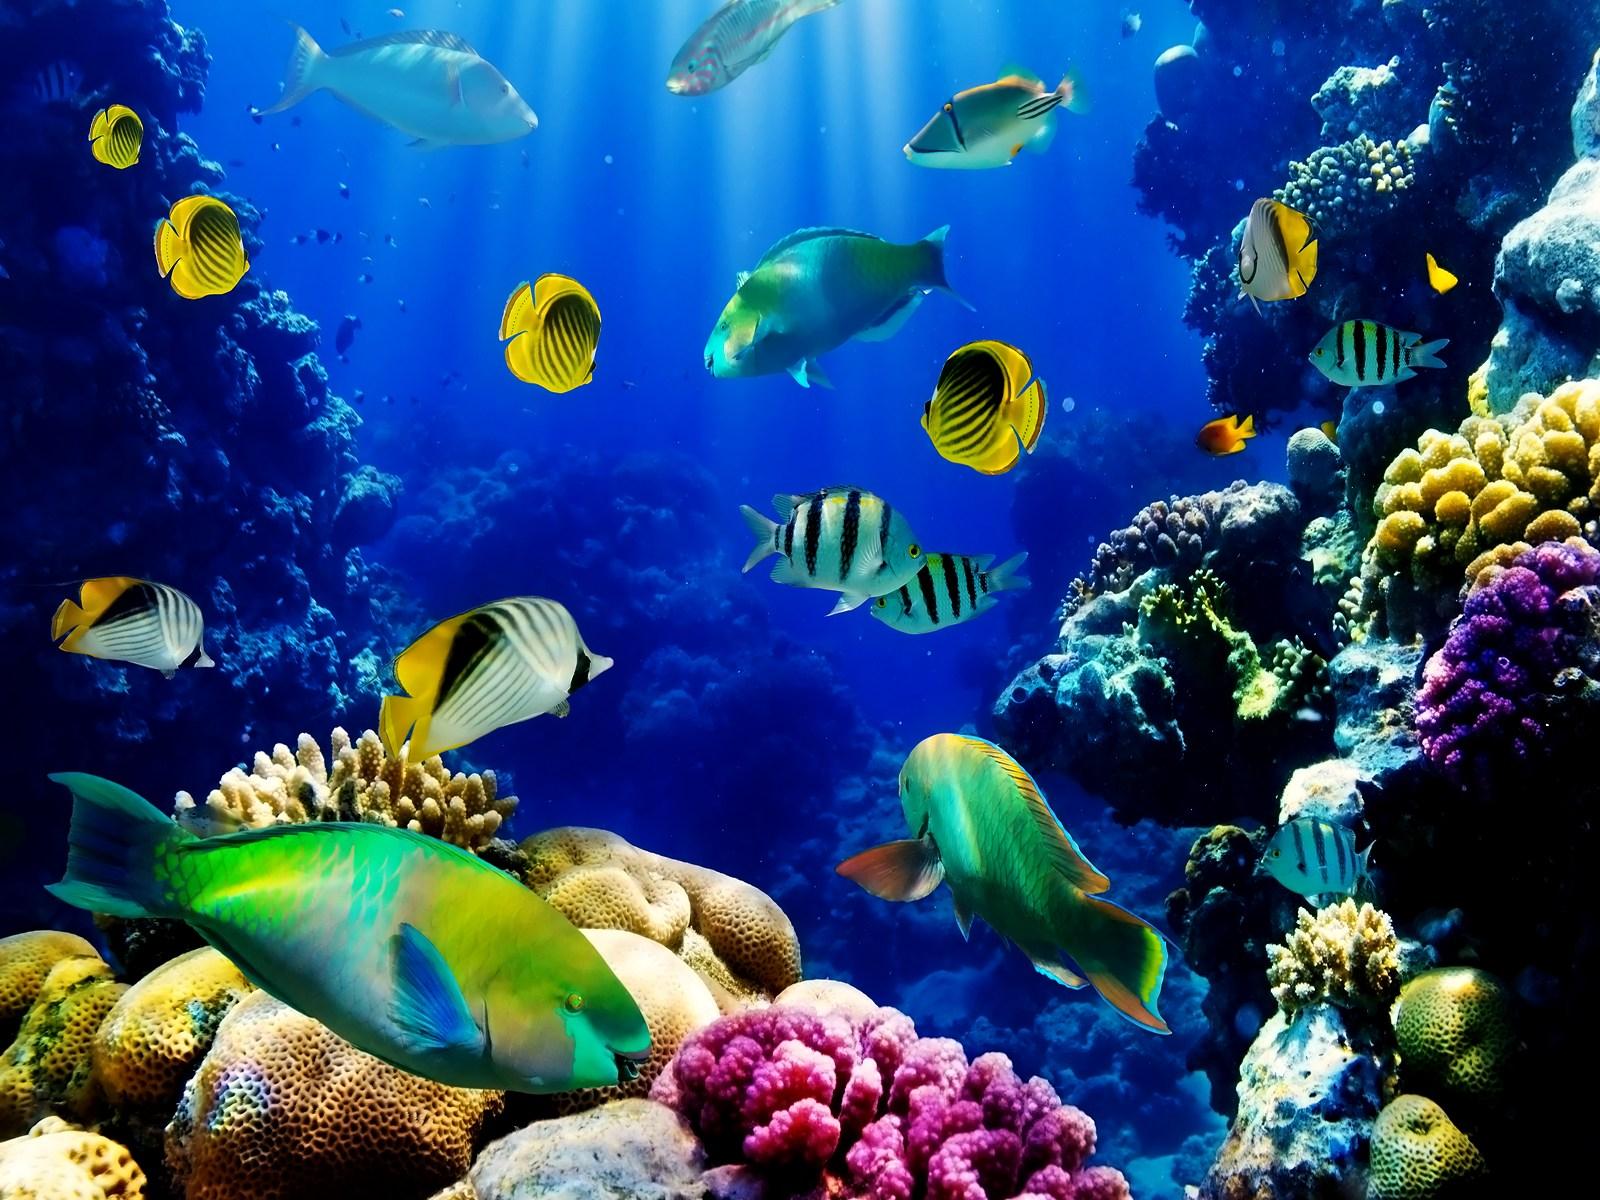 3d Live Wallpapers For Pc Wallpapersafari Aquarium Fish 89743 Hd Wallpaper Backgrounds Download